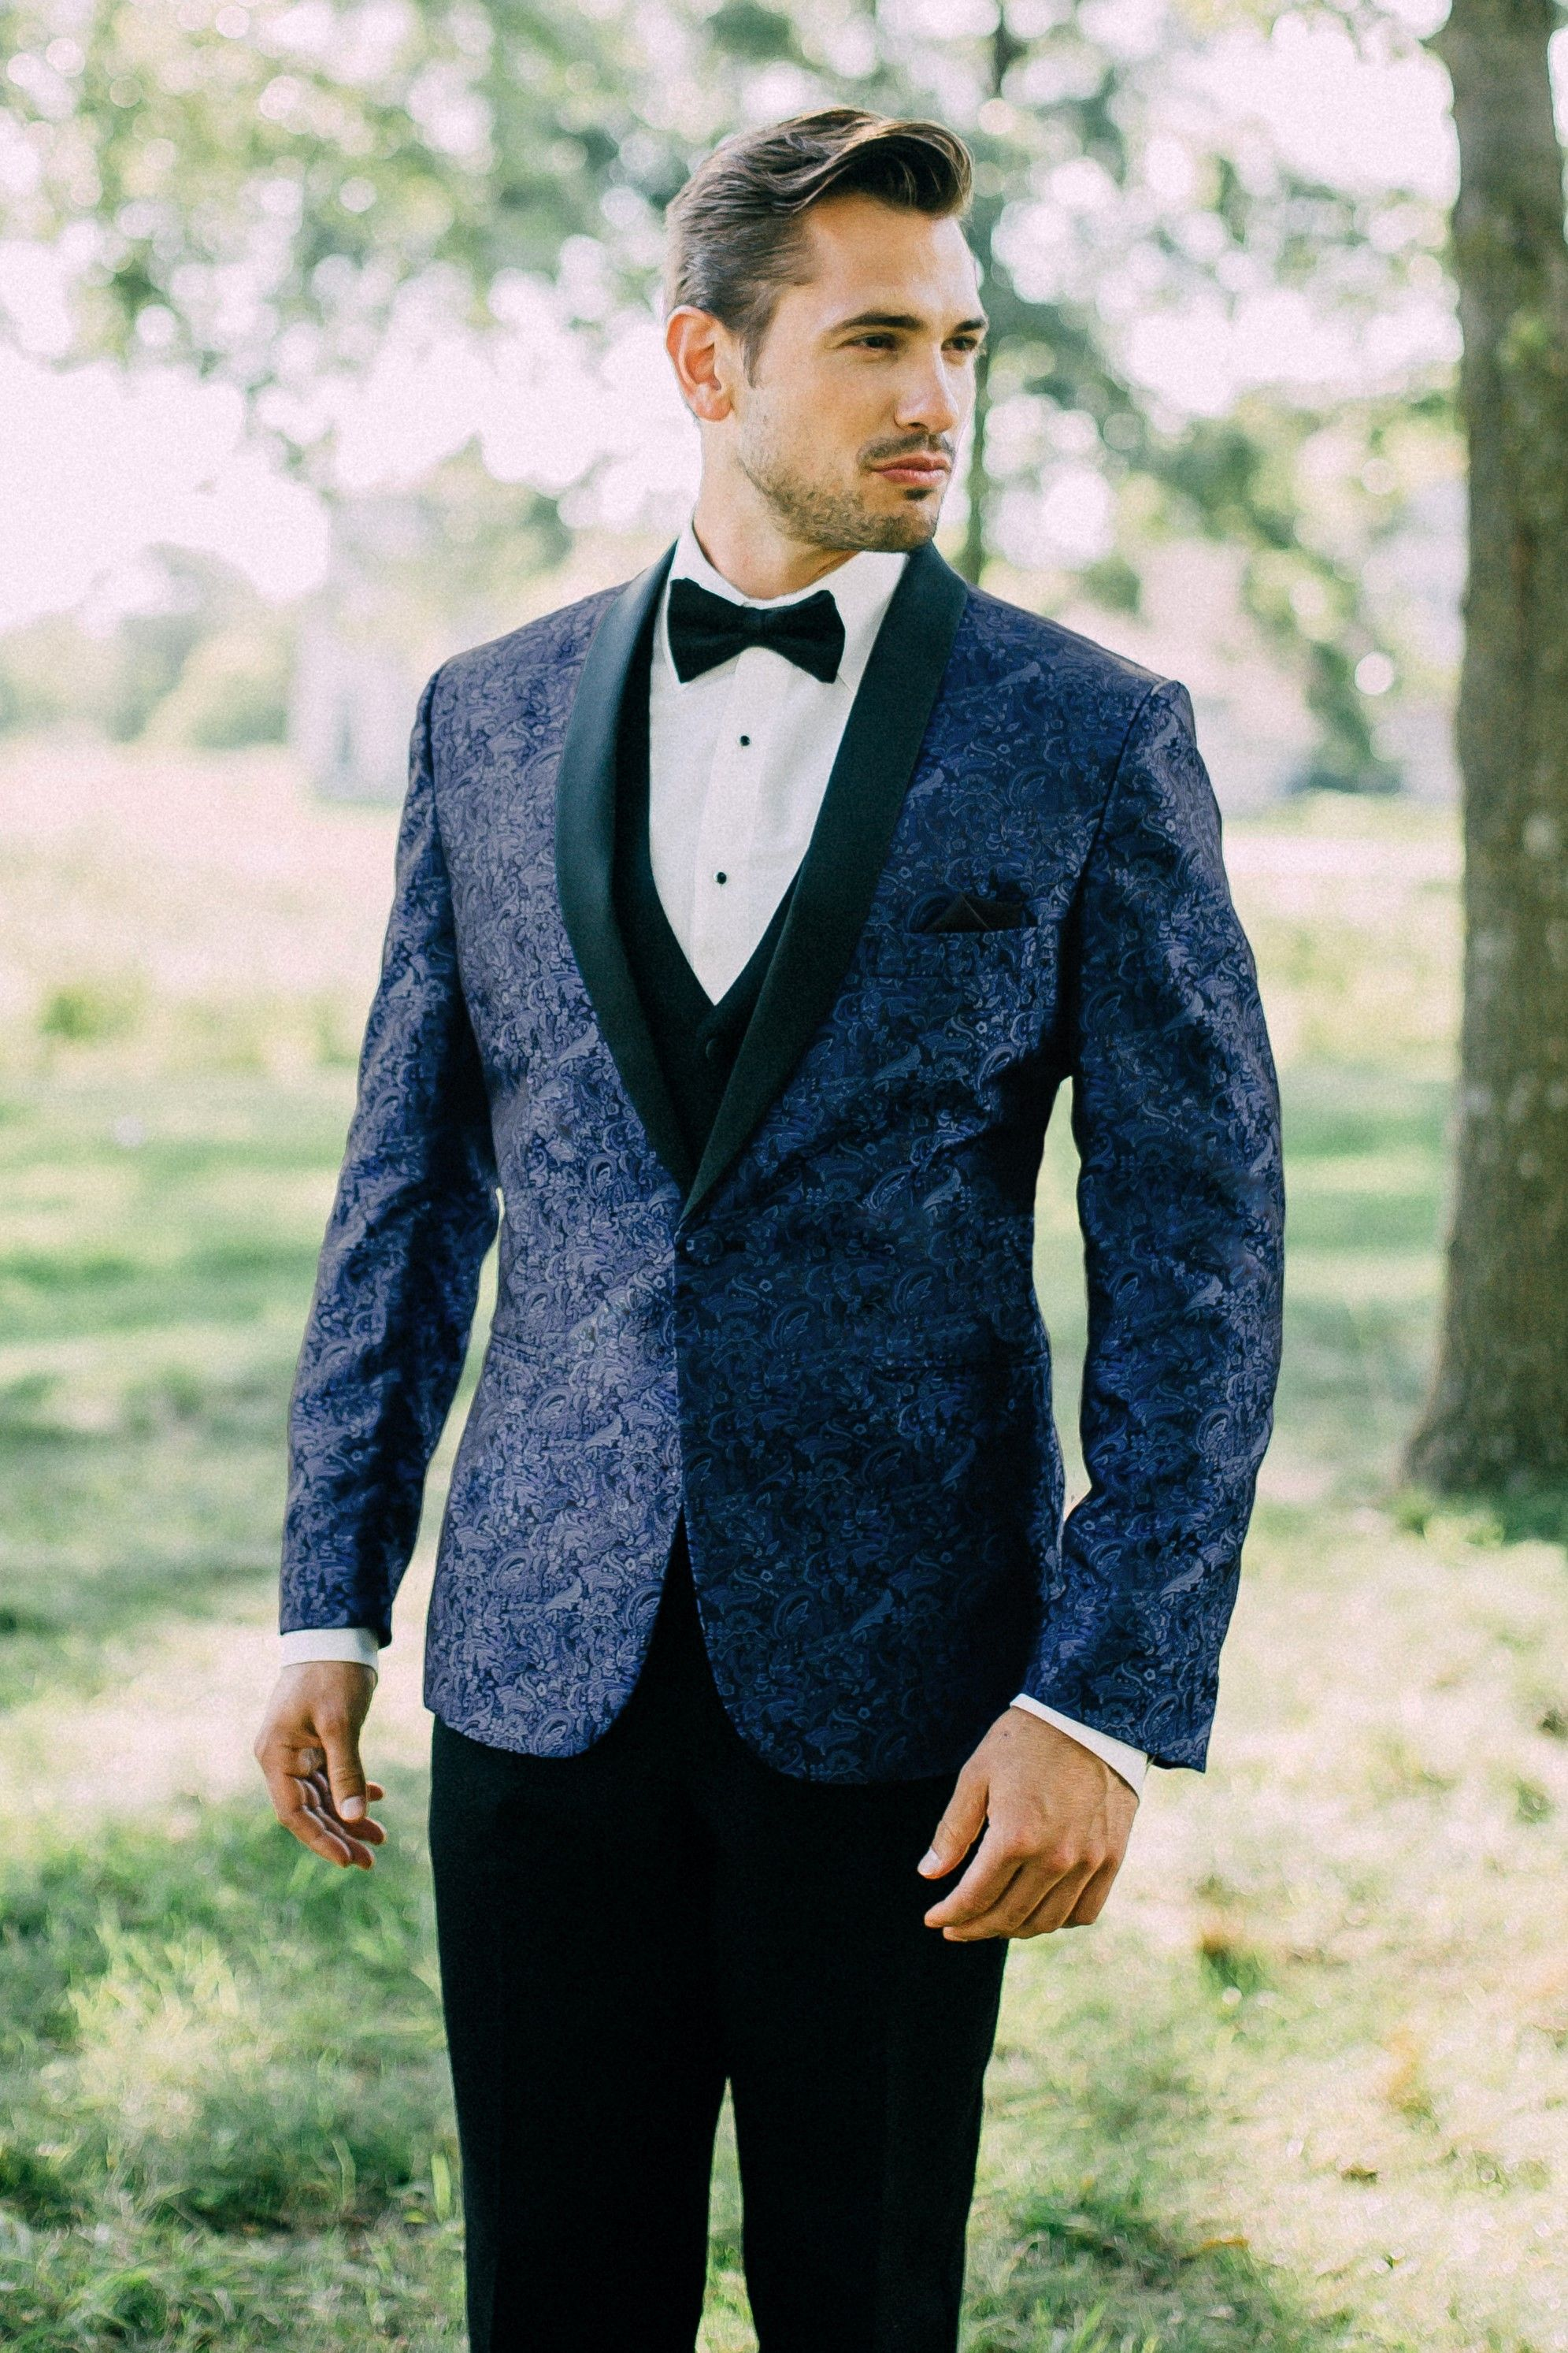 Coming in 2018 Blue tuxedos, Tuxedo rental, Formal wear